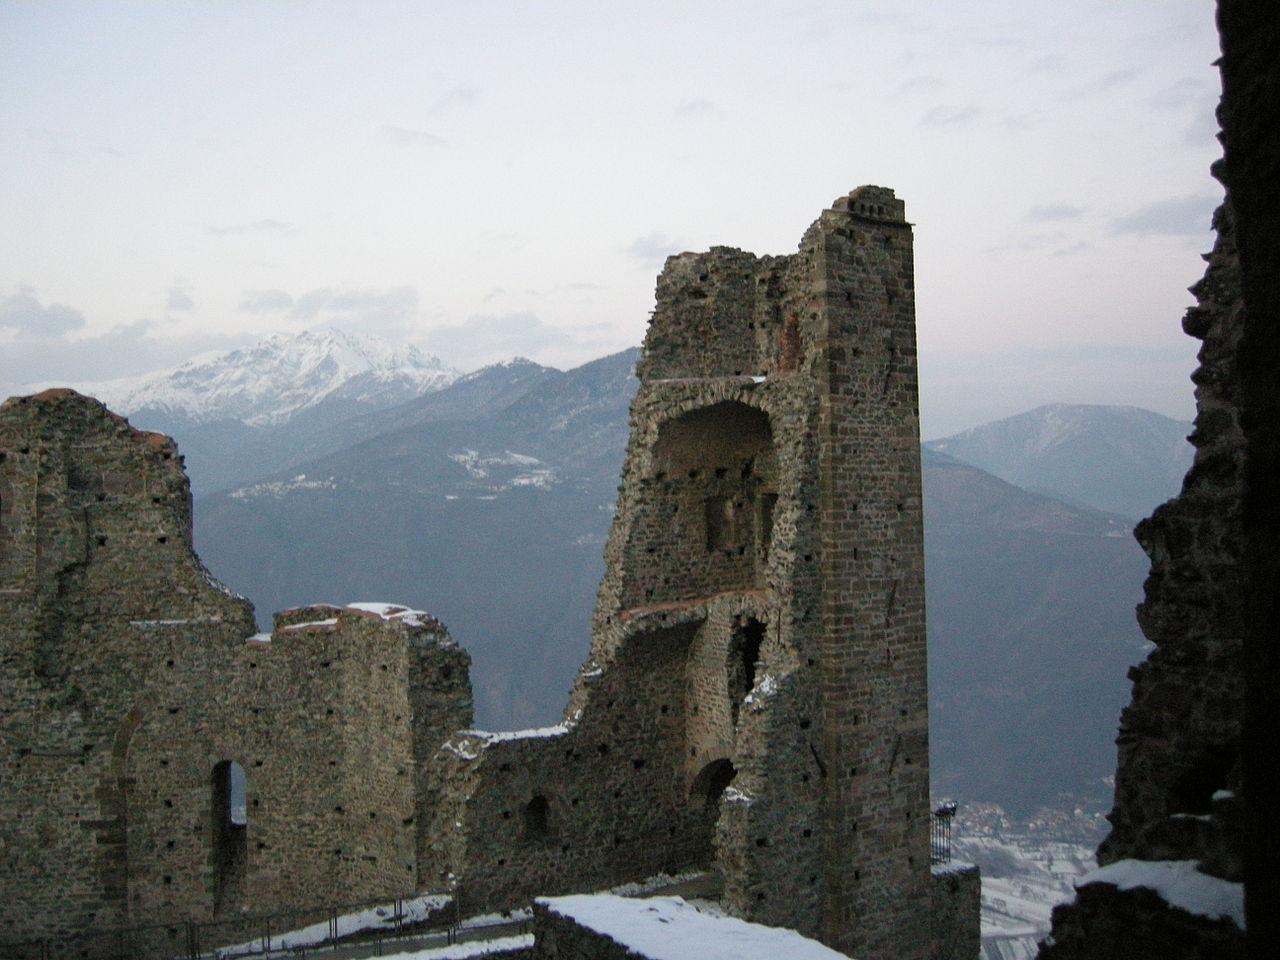 Torre_della_bell'alda